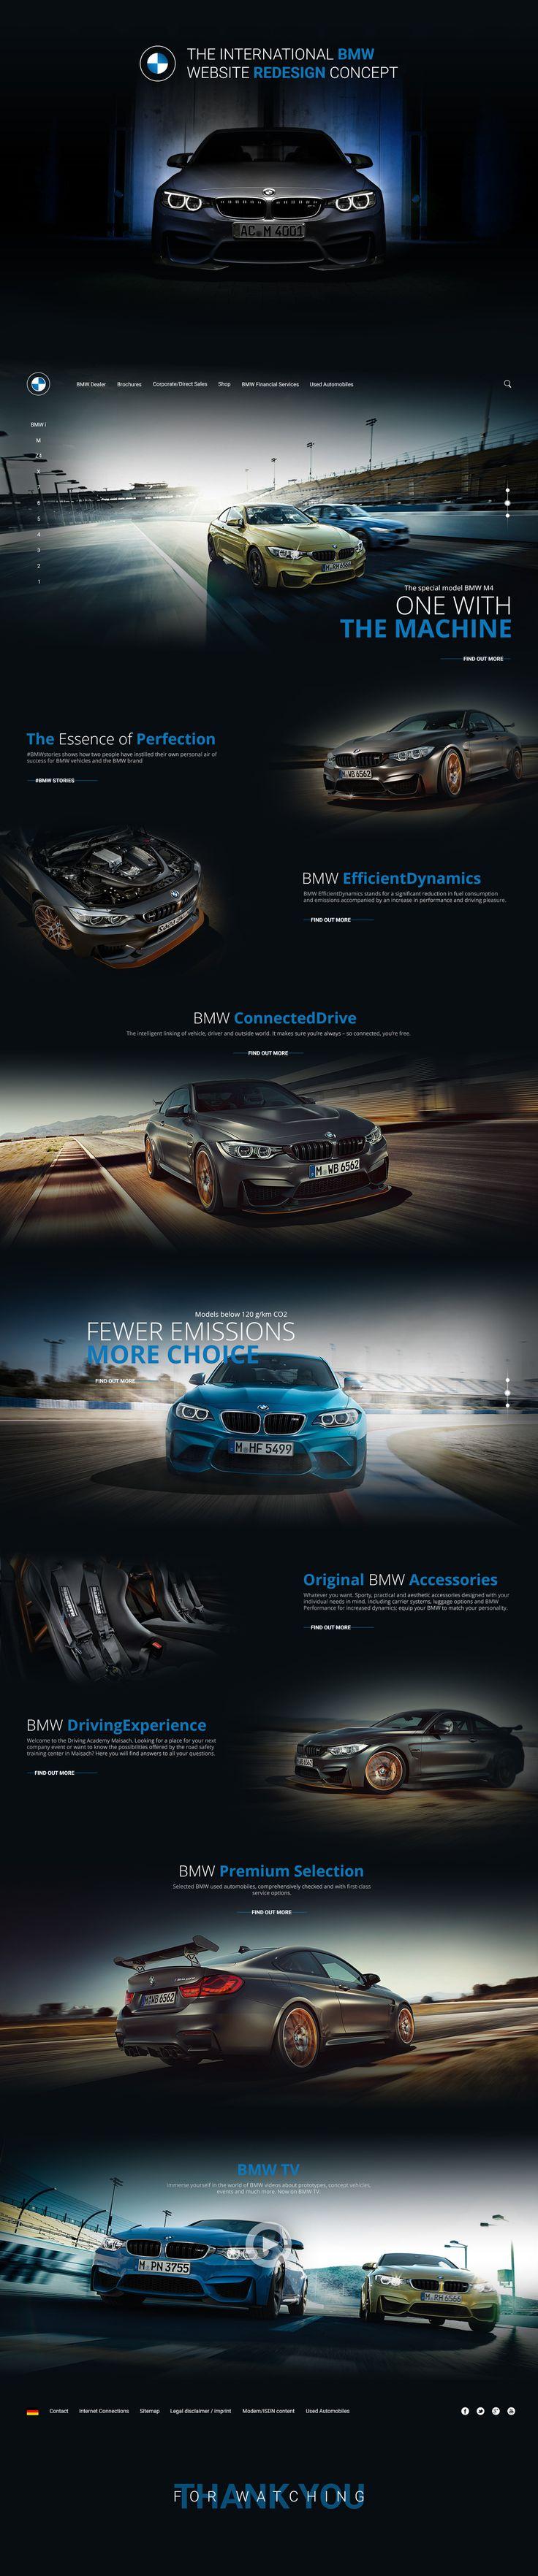 The international BMW website redesign concept on Behance